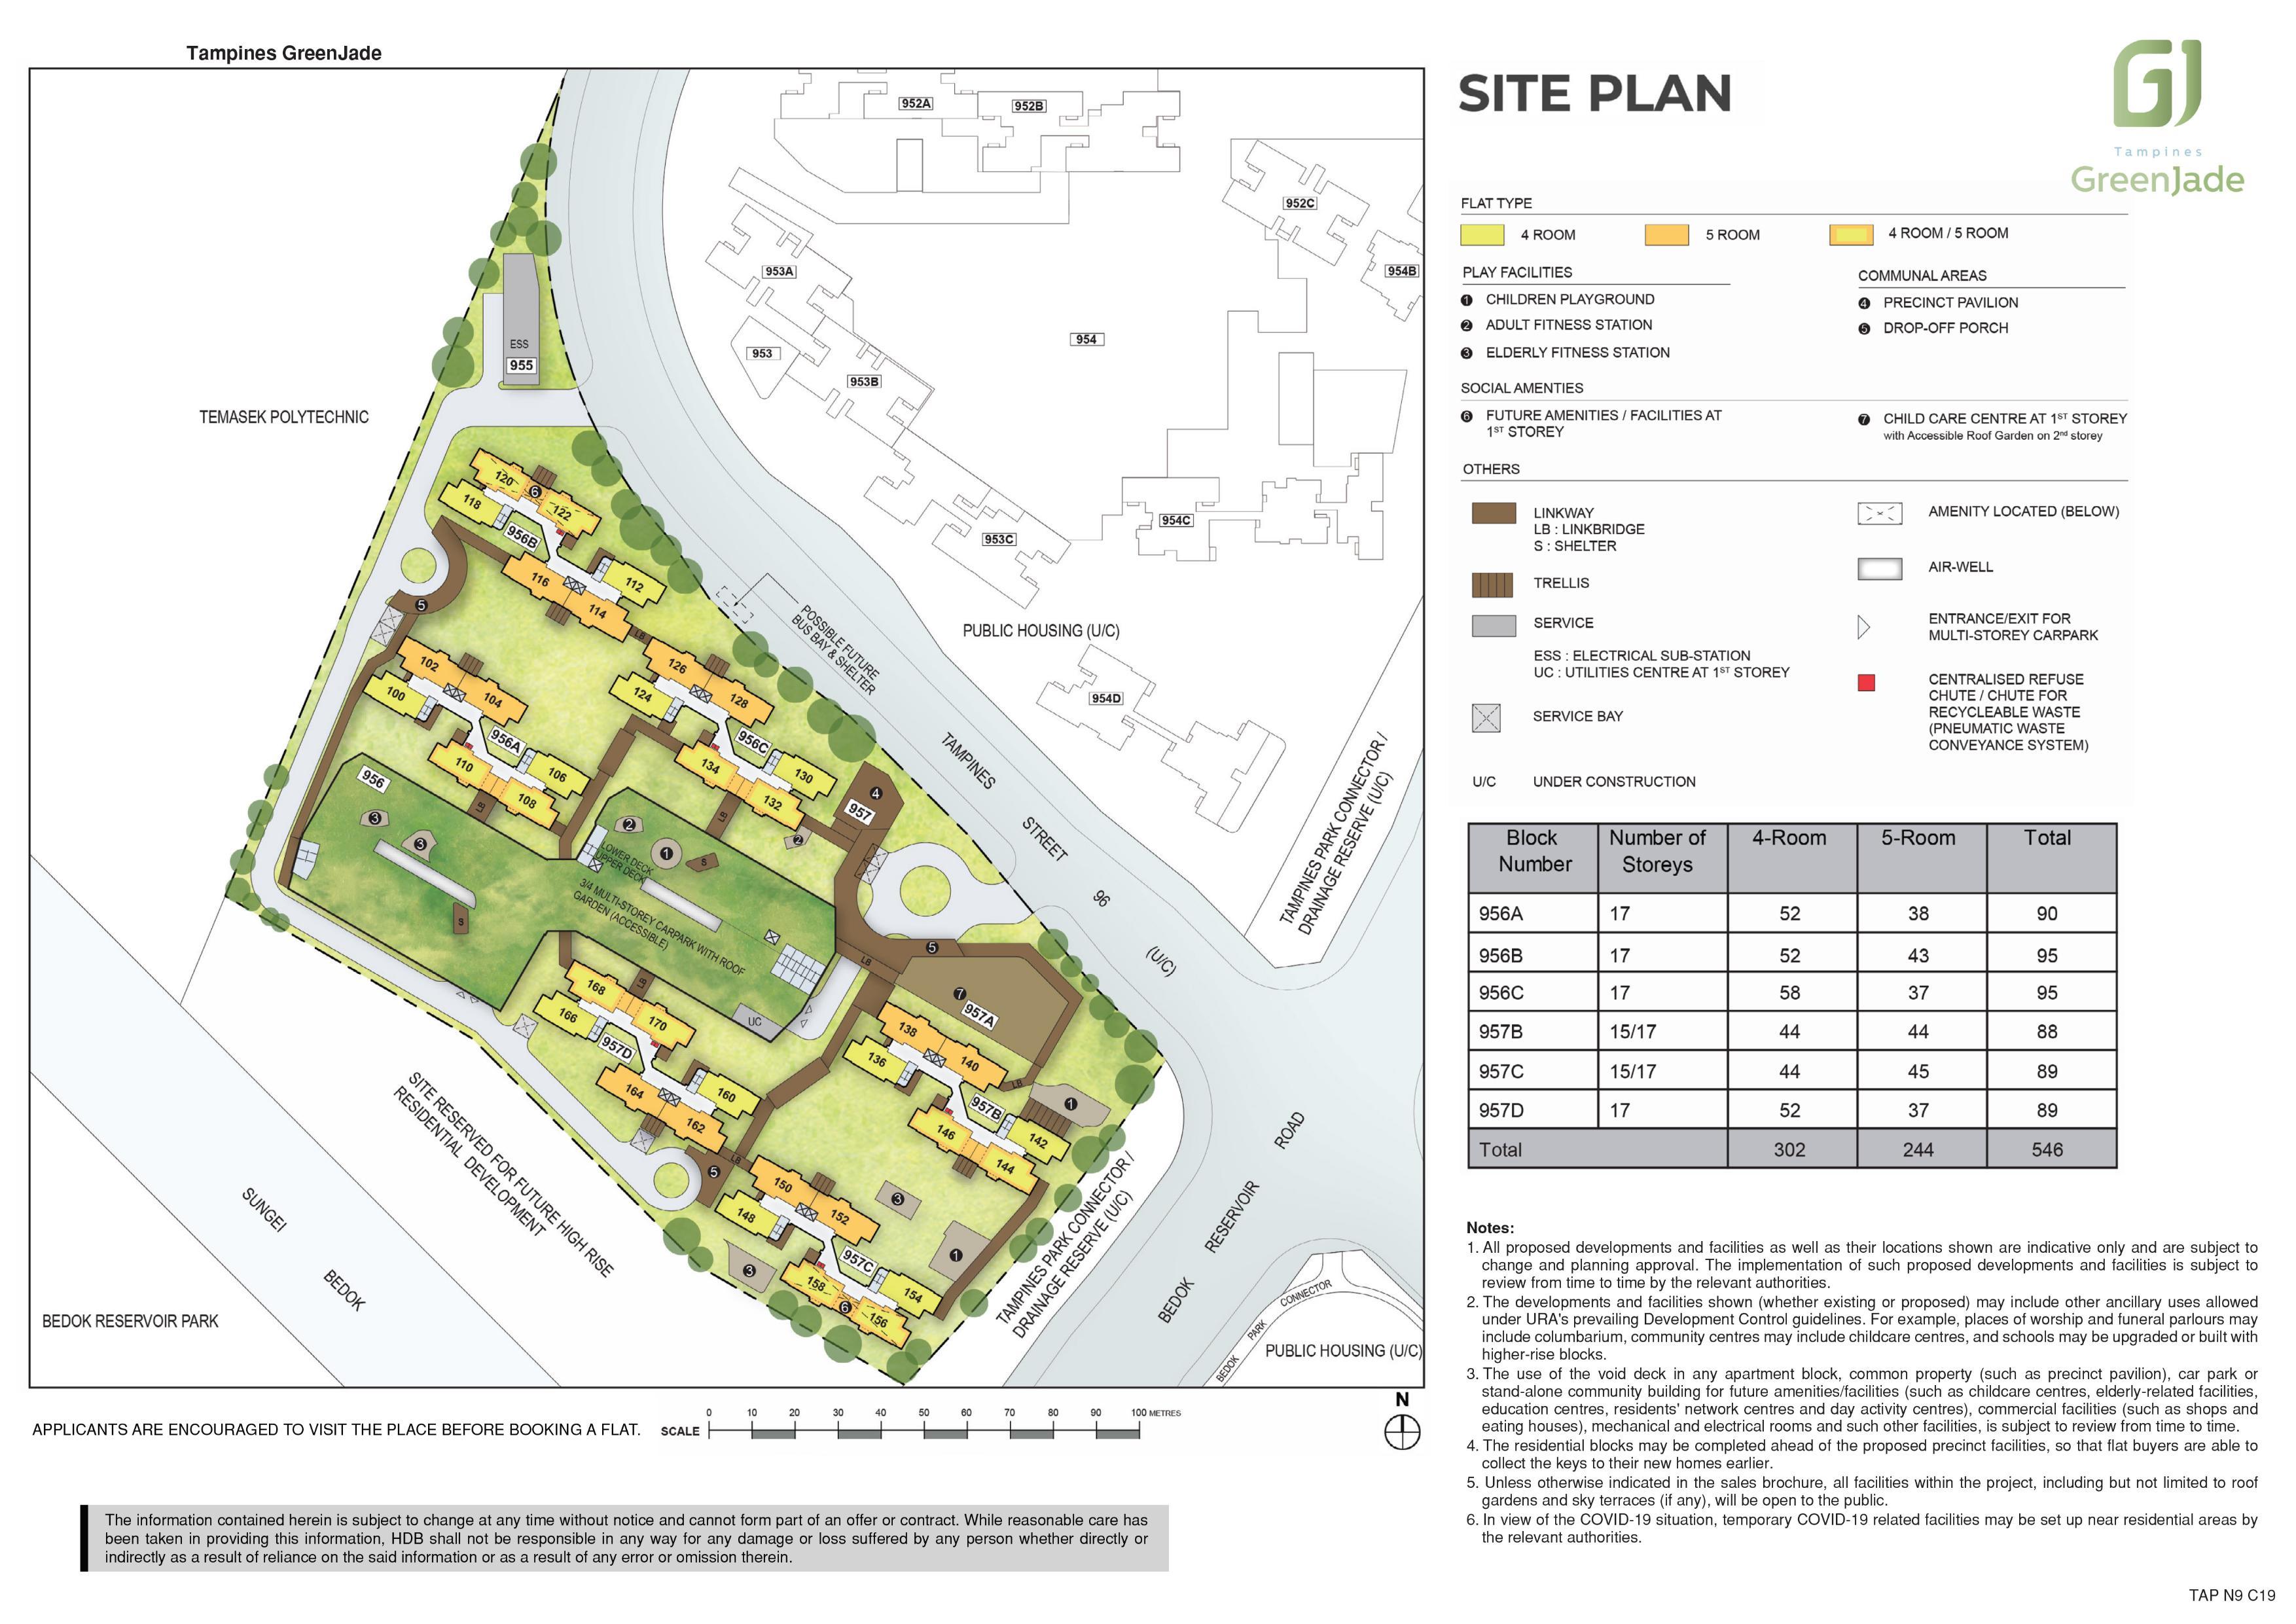 Tampines GreenJade Site Plan